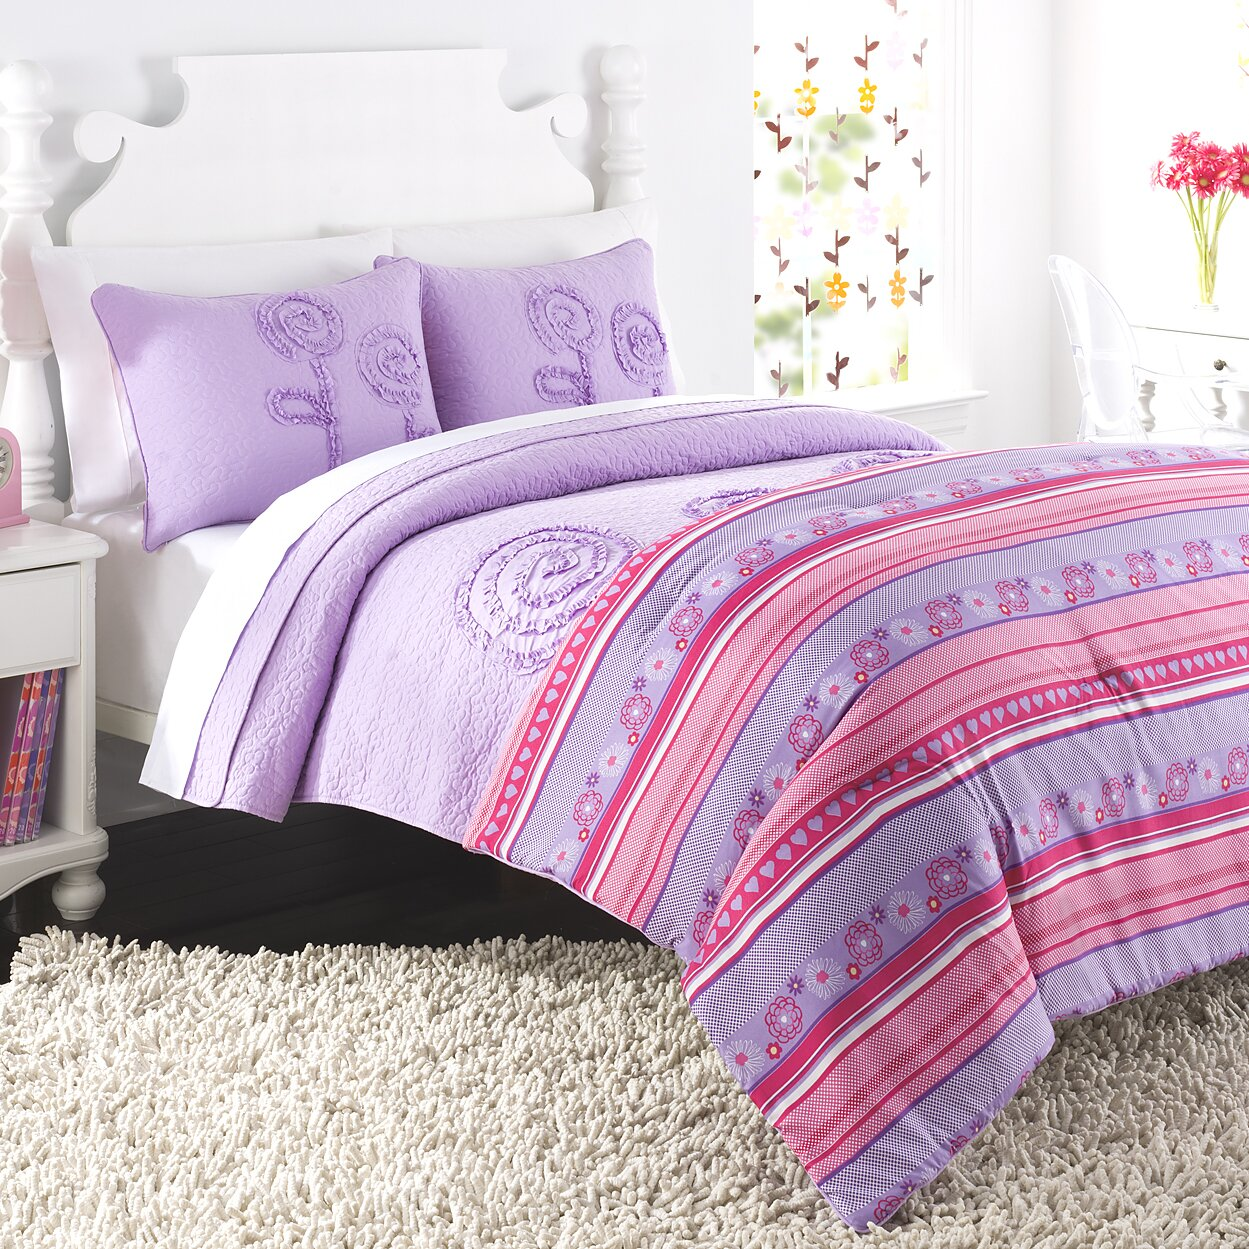 Bed sheet set with quilt - Rachel Reversible Quilt Set